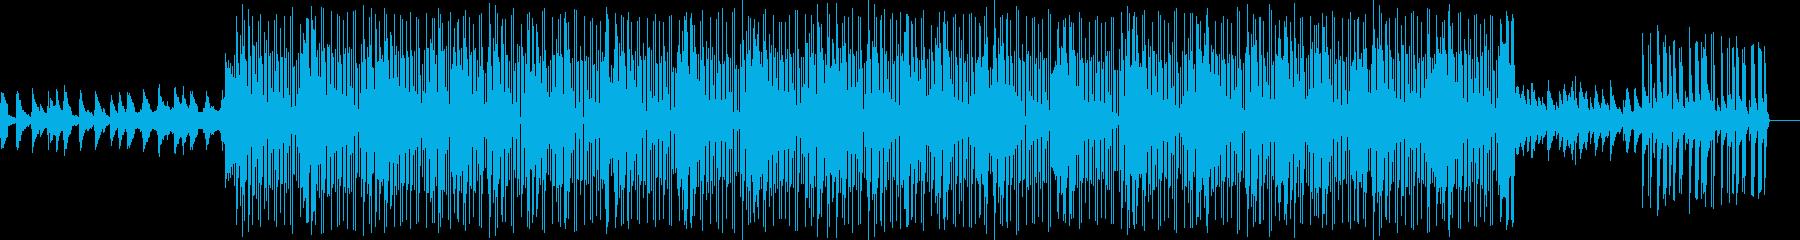 lo-fiピアノガットギタービート曲の再生済みの波形